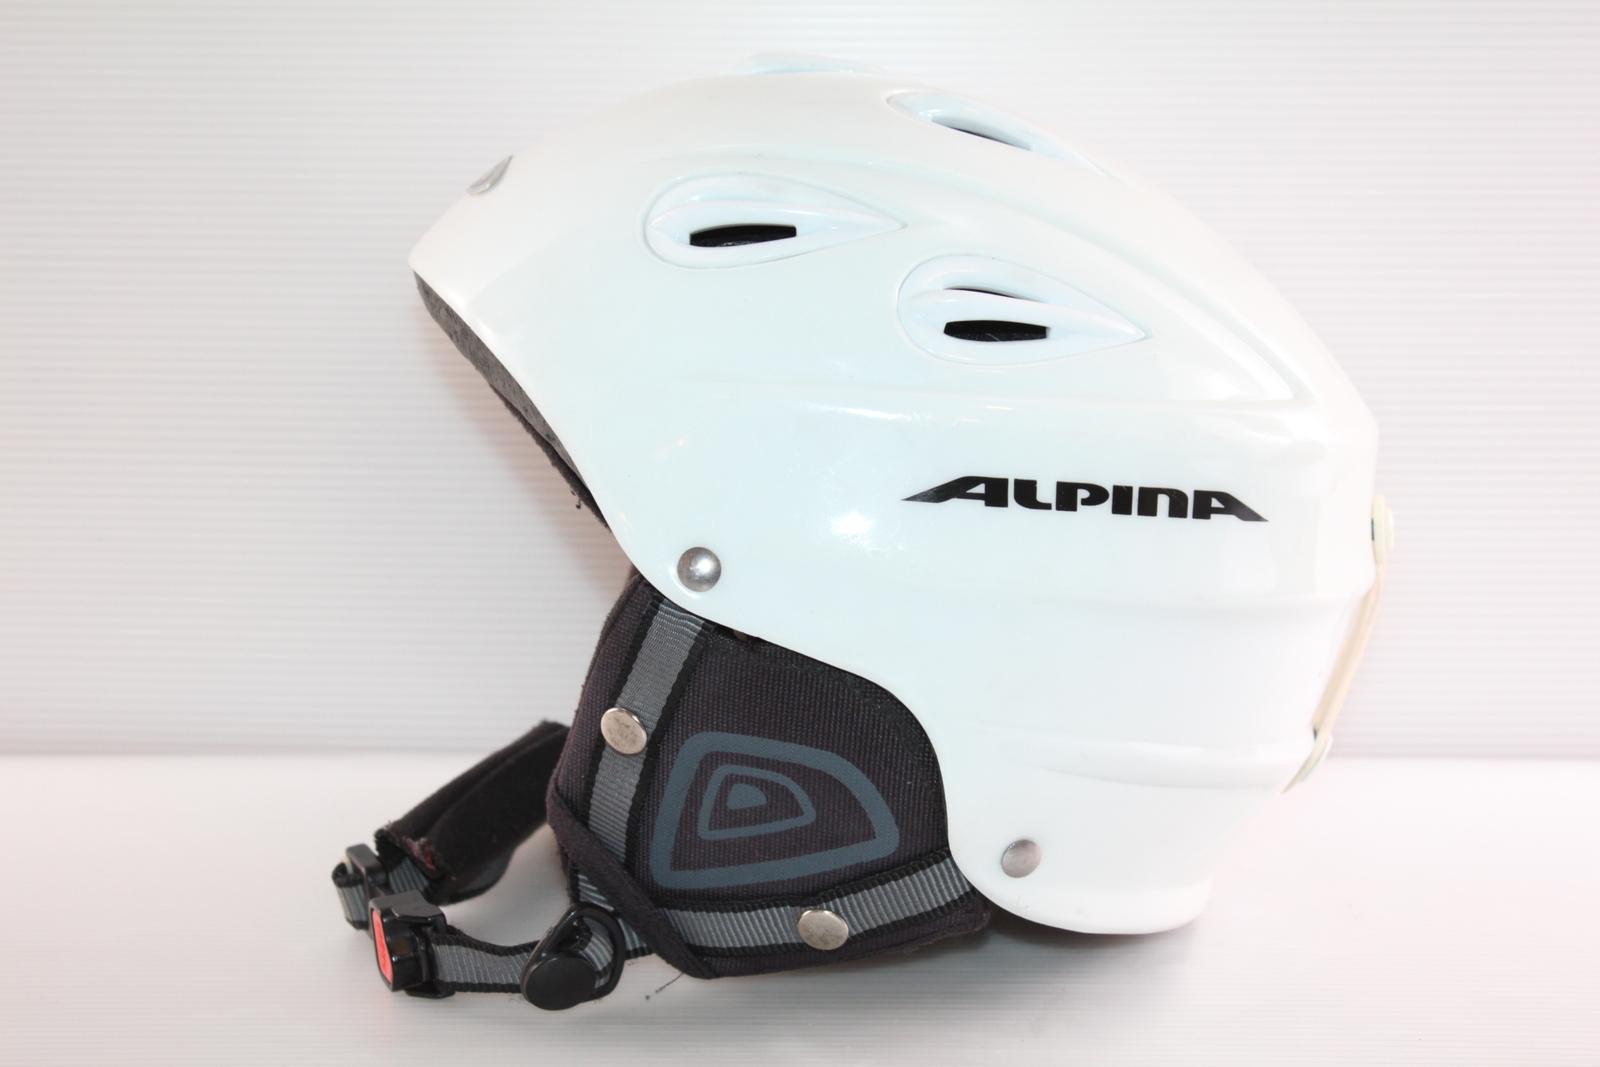 Dámská lyžařská helma Alpina Junta Eco - posuvná vel. 54 - 57